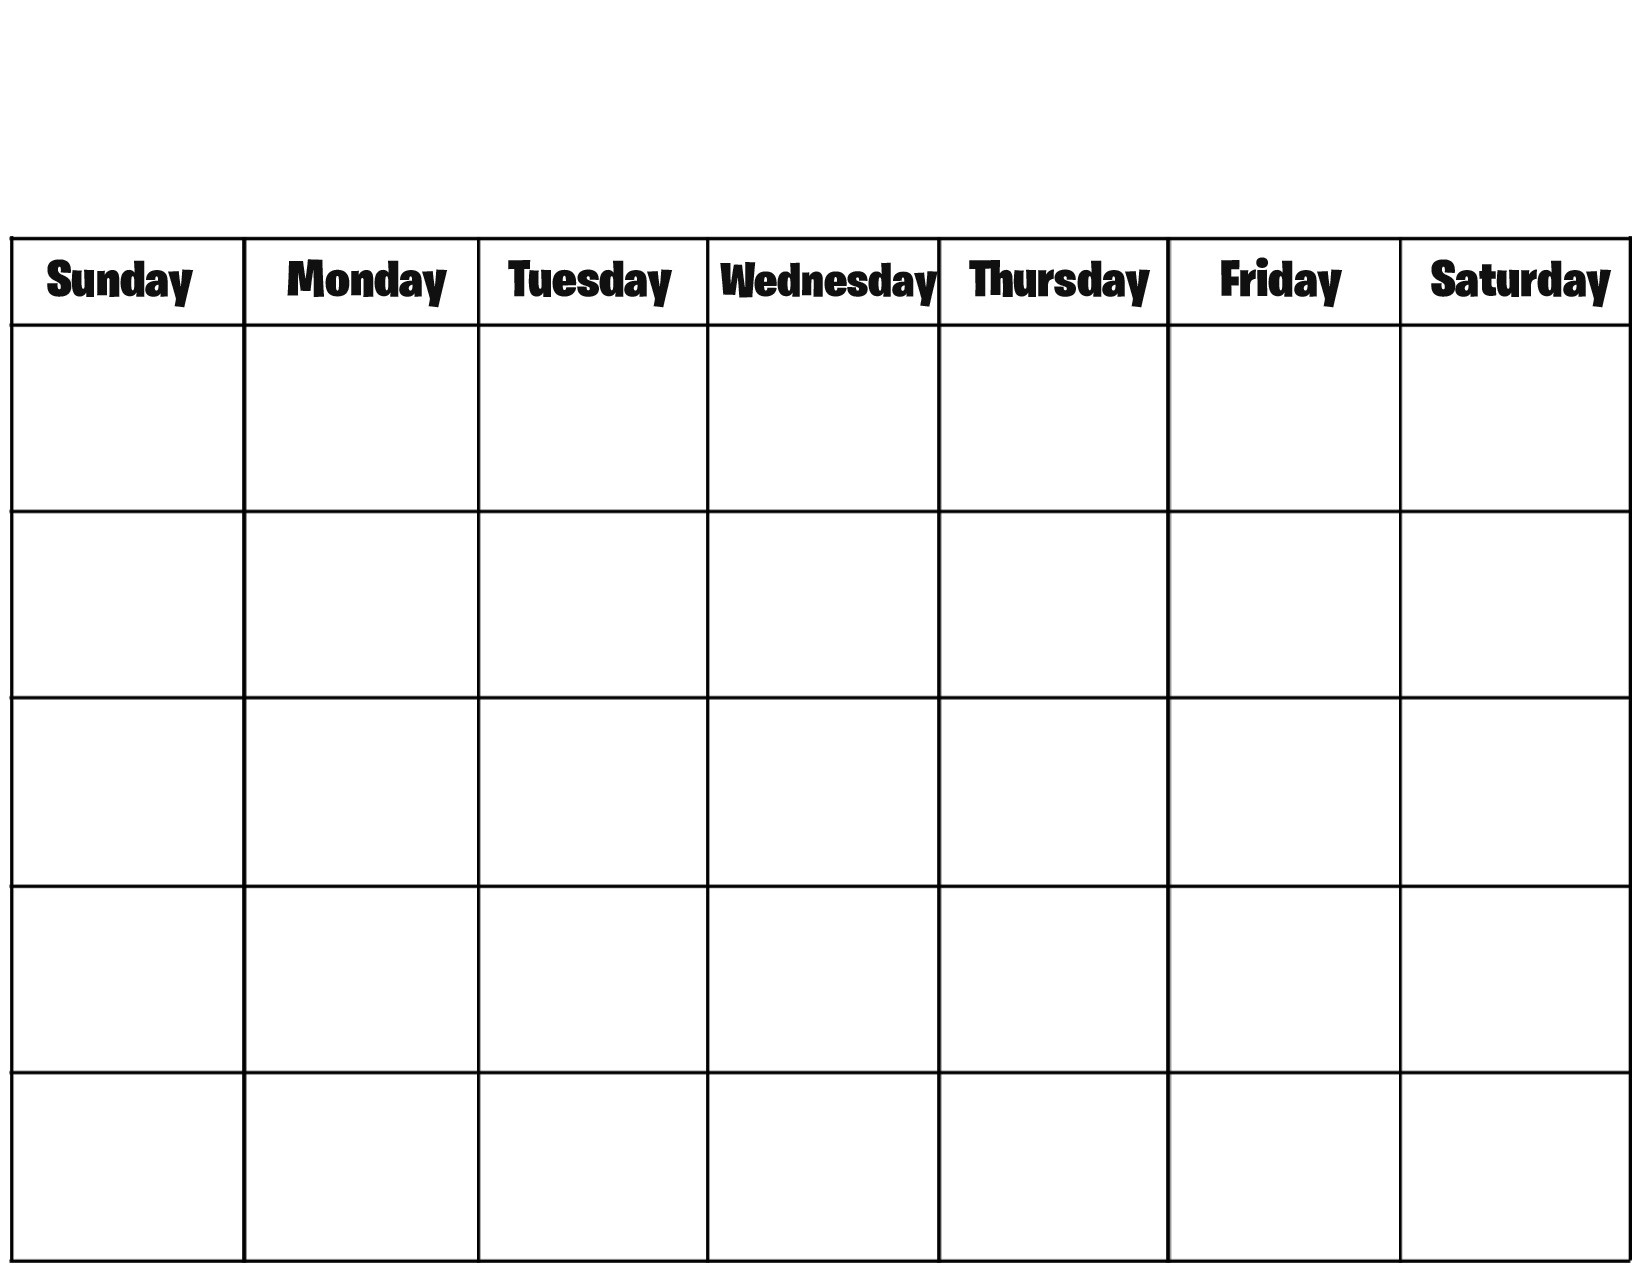 How To Print An Blank Calendar Fully On A Page 2018 Calendar  Xjb